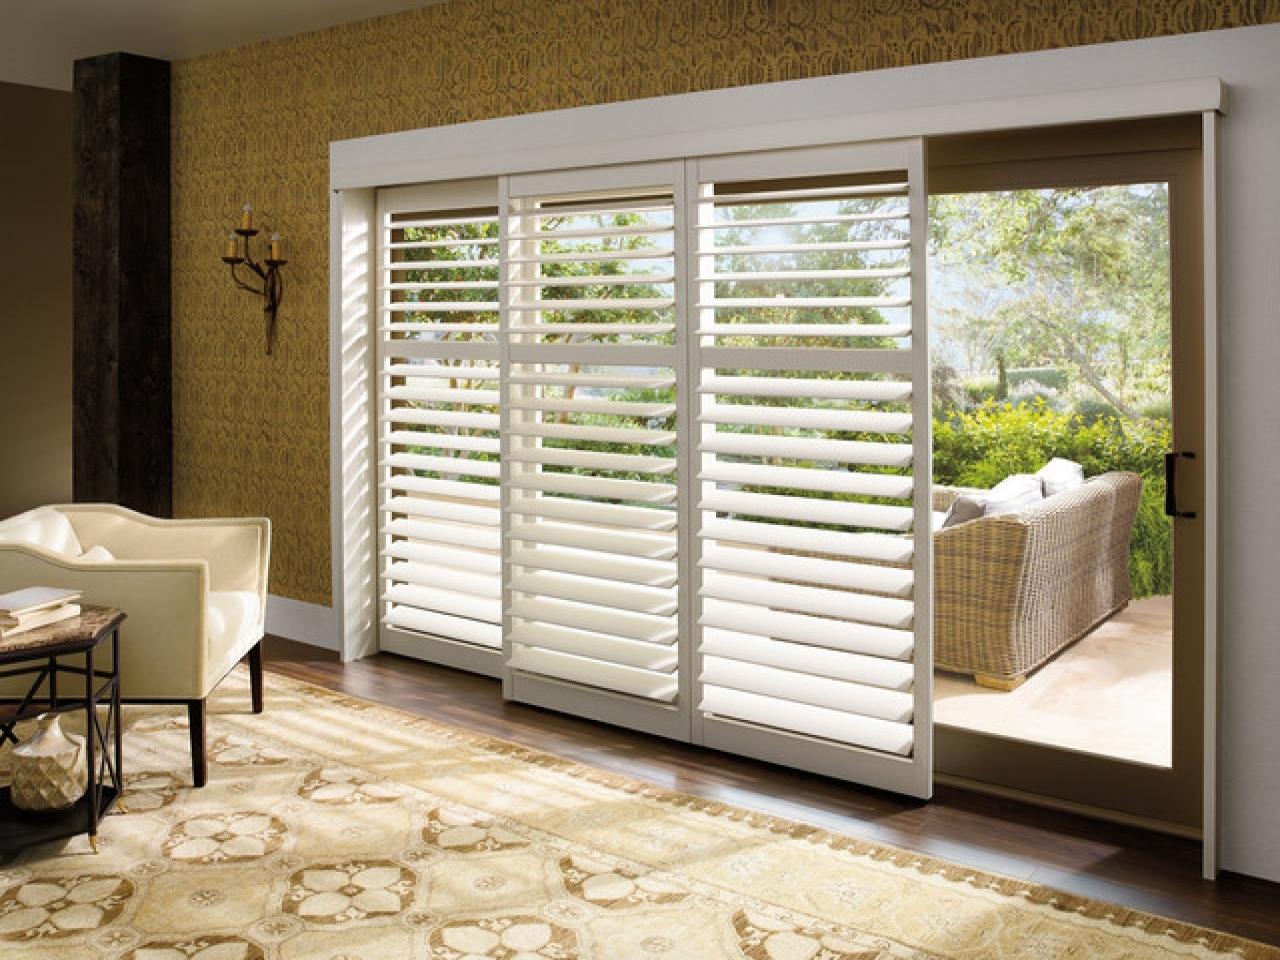 Window Shades Sliding Glass Doorswindow treatments for sliding glass doors ideas tips